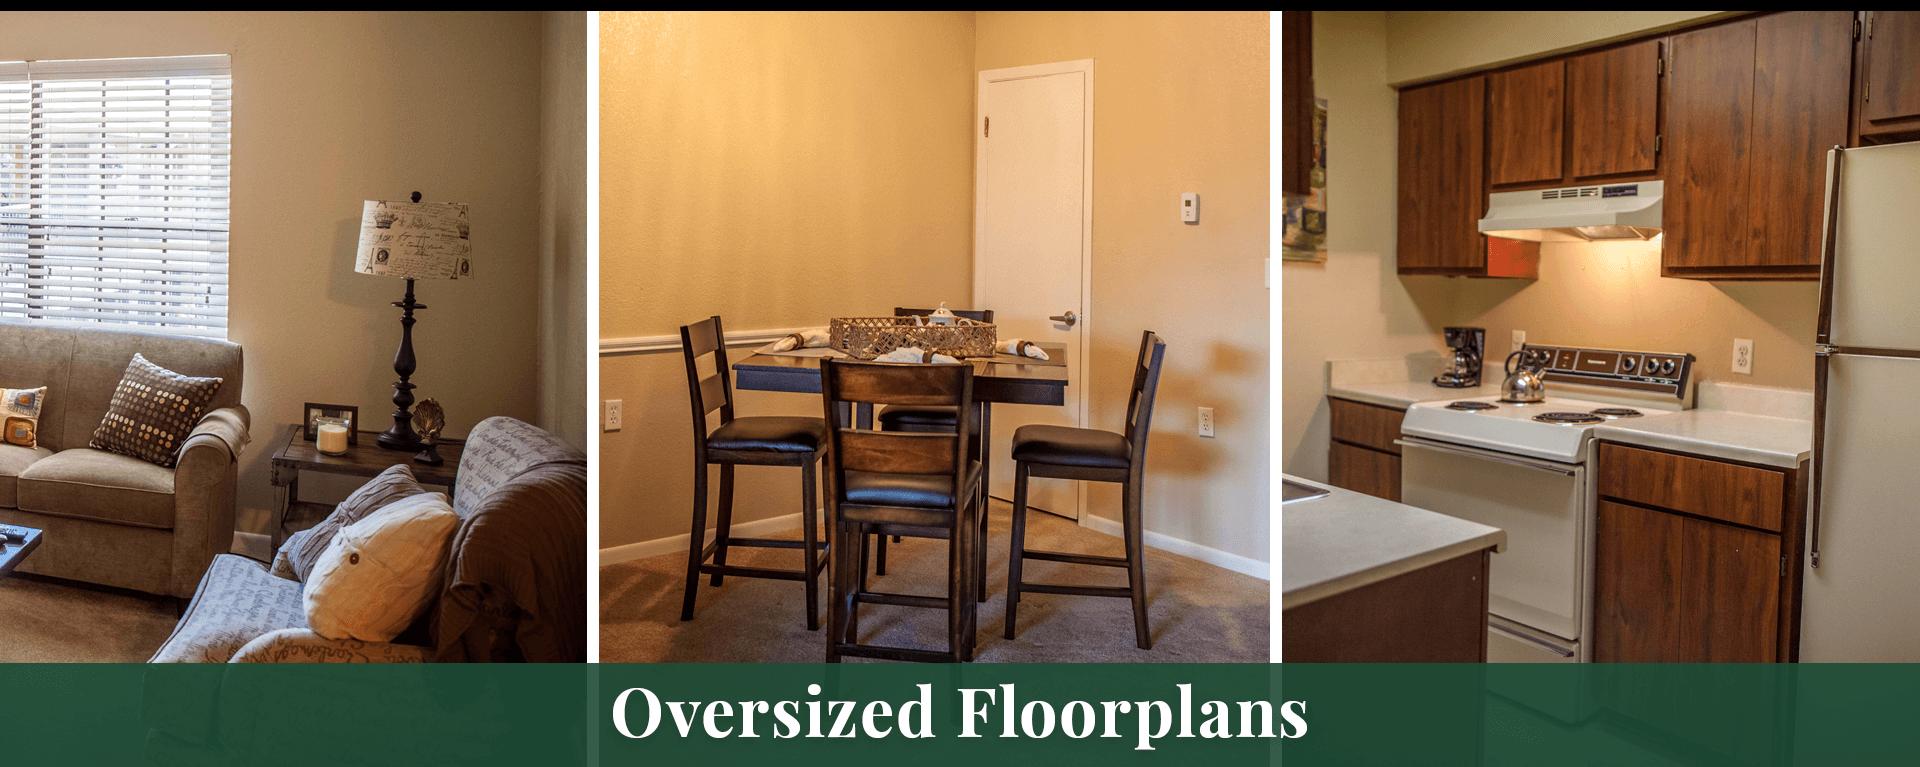 Waldenbrooke_Oversized_Floorplans (1)